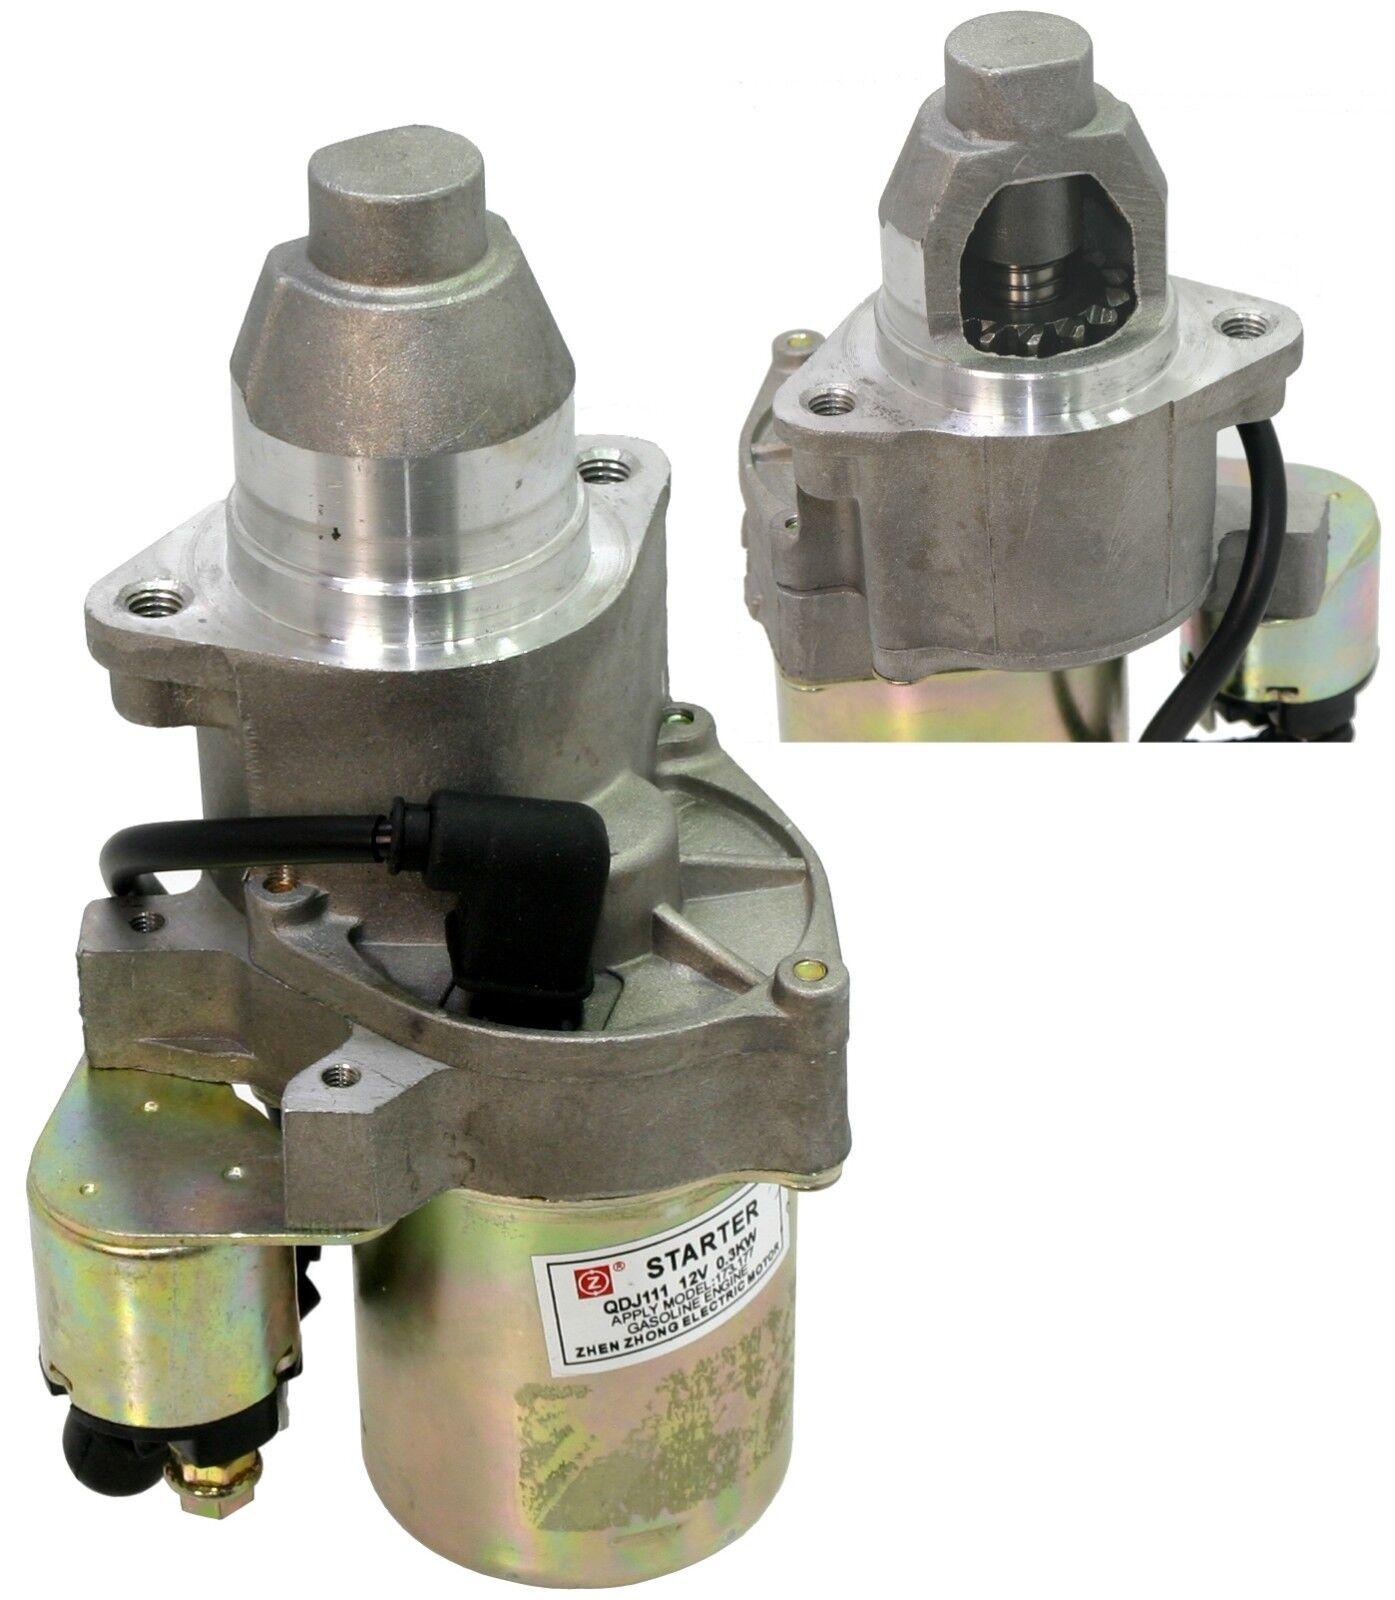 24012400 Starter Motor Engine Launtop with Tree Horizontal LT270